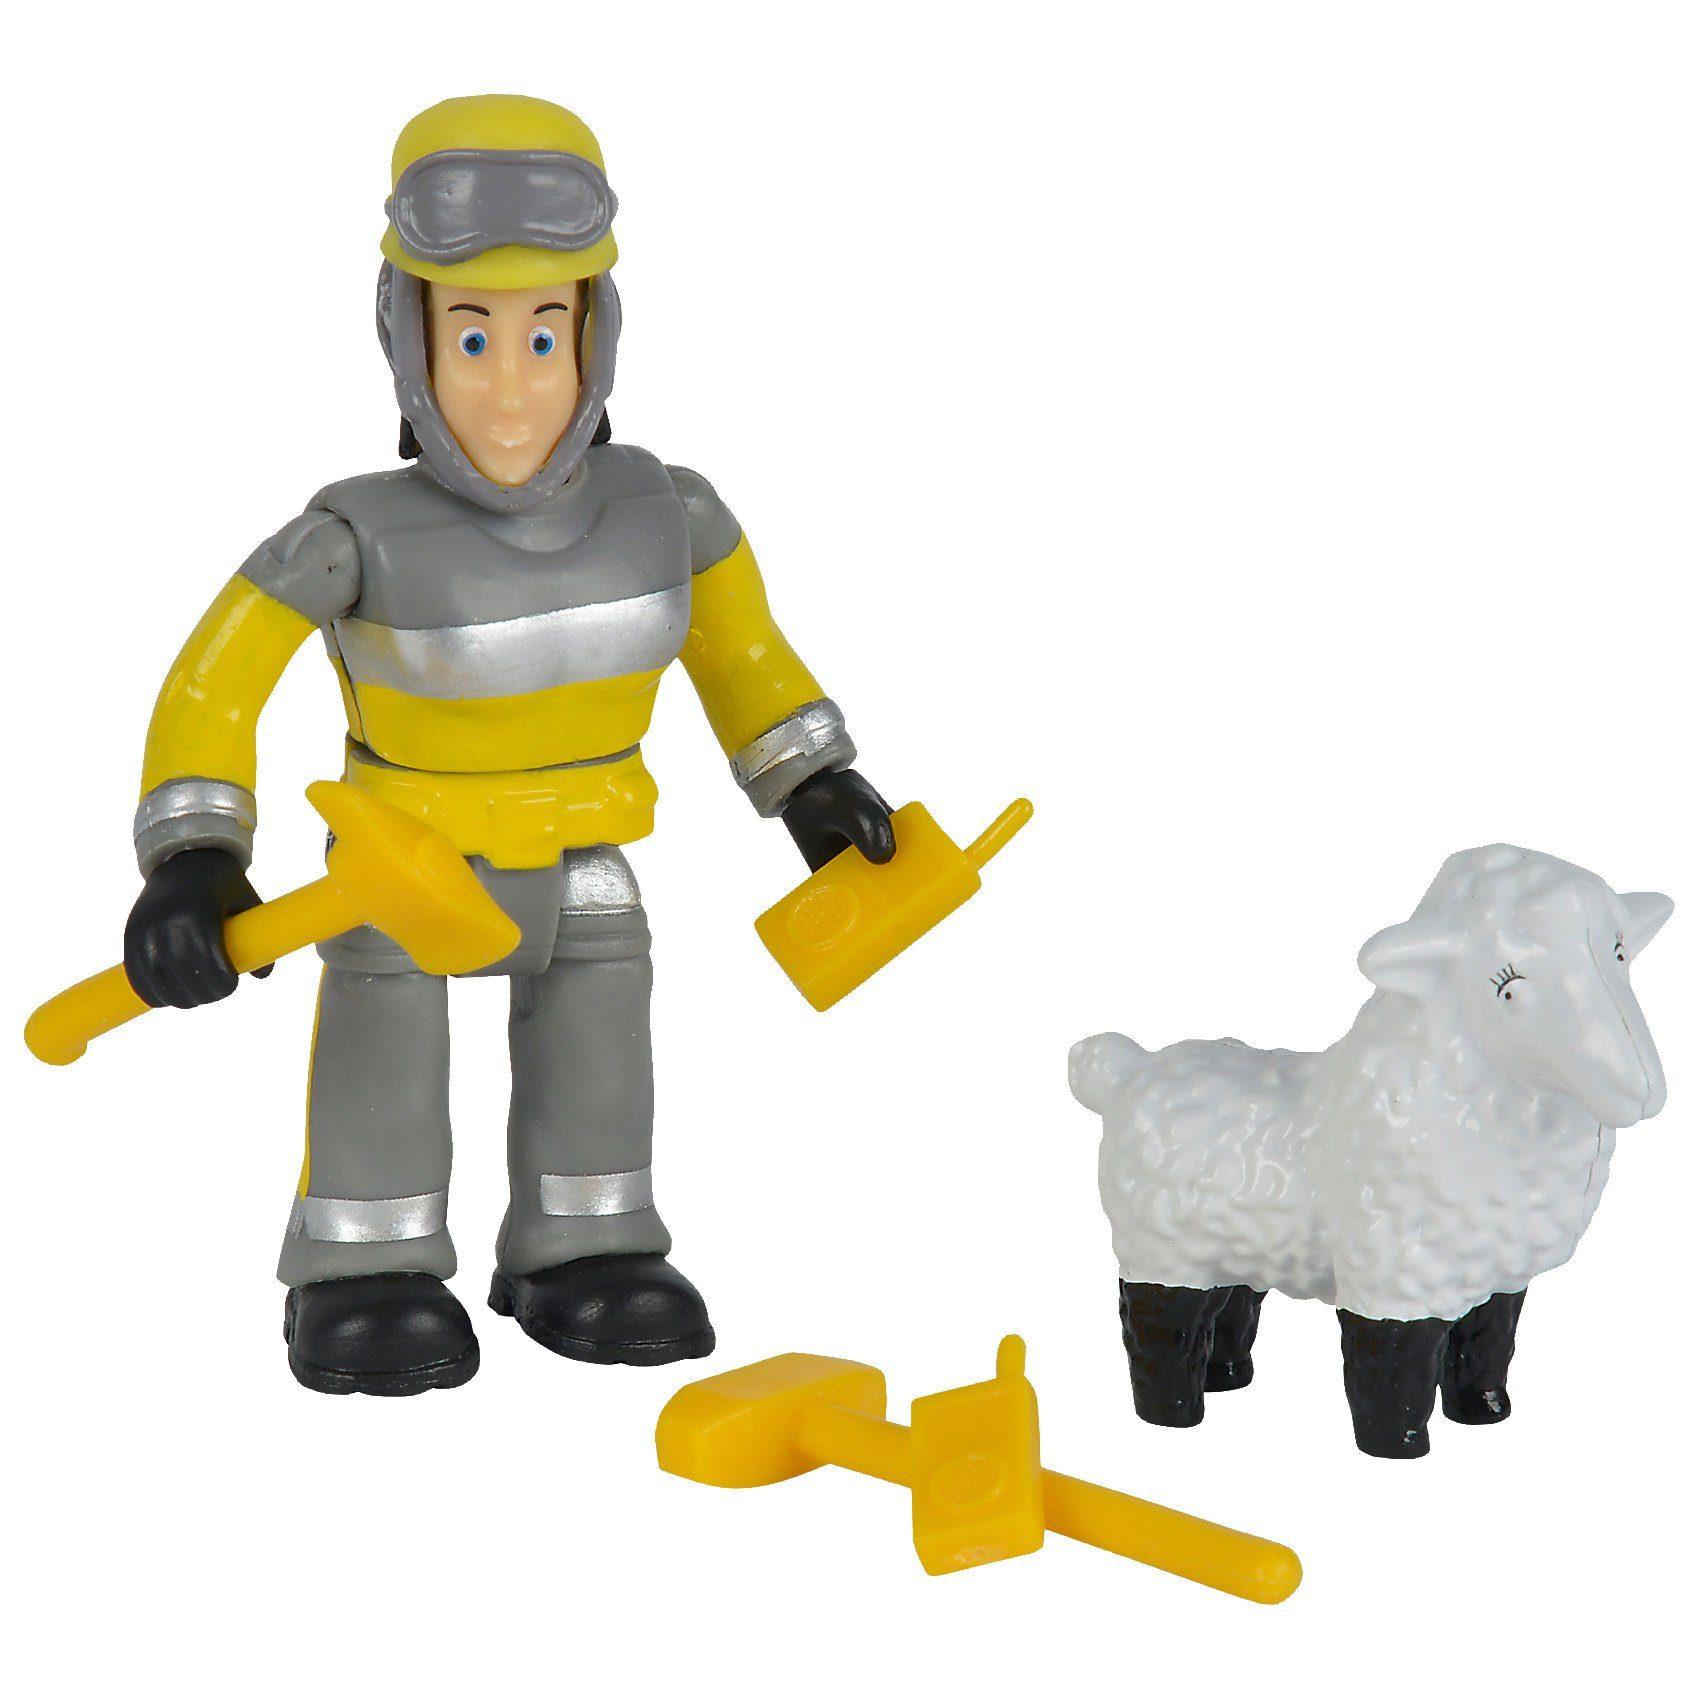 SIMBA Feuerwehrmann Sam - Tierrettung Figuren Set Elvis + Wolli